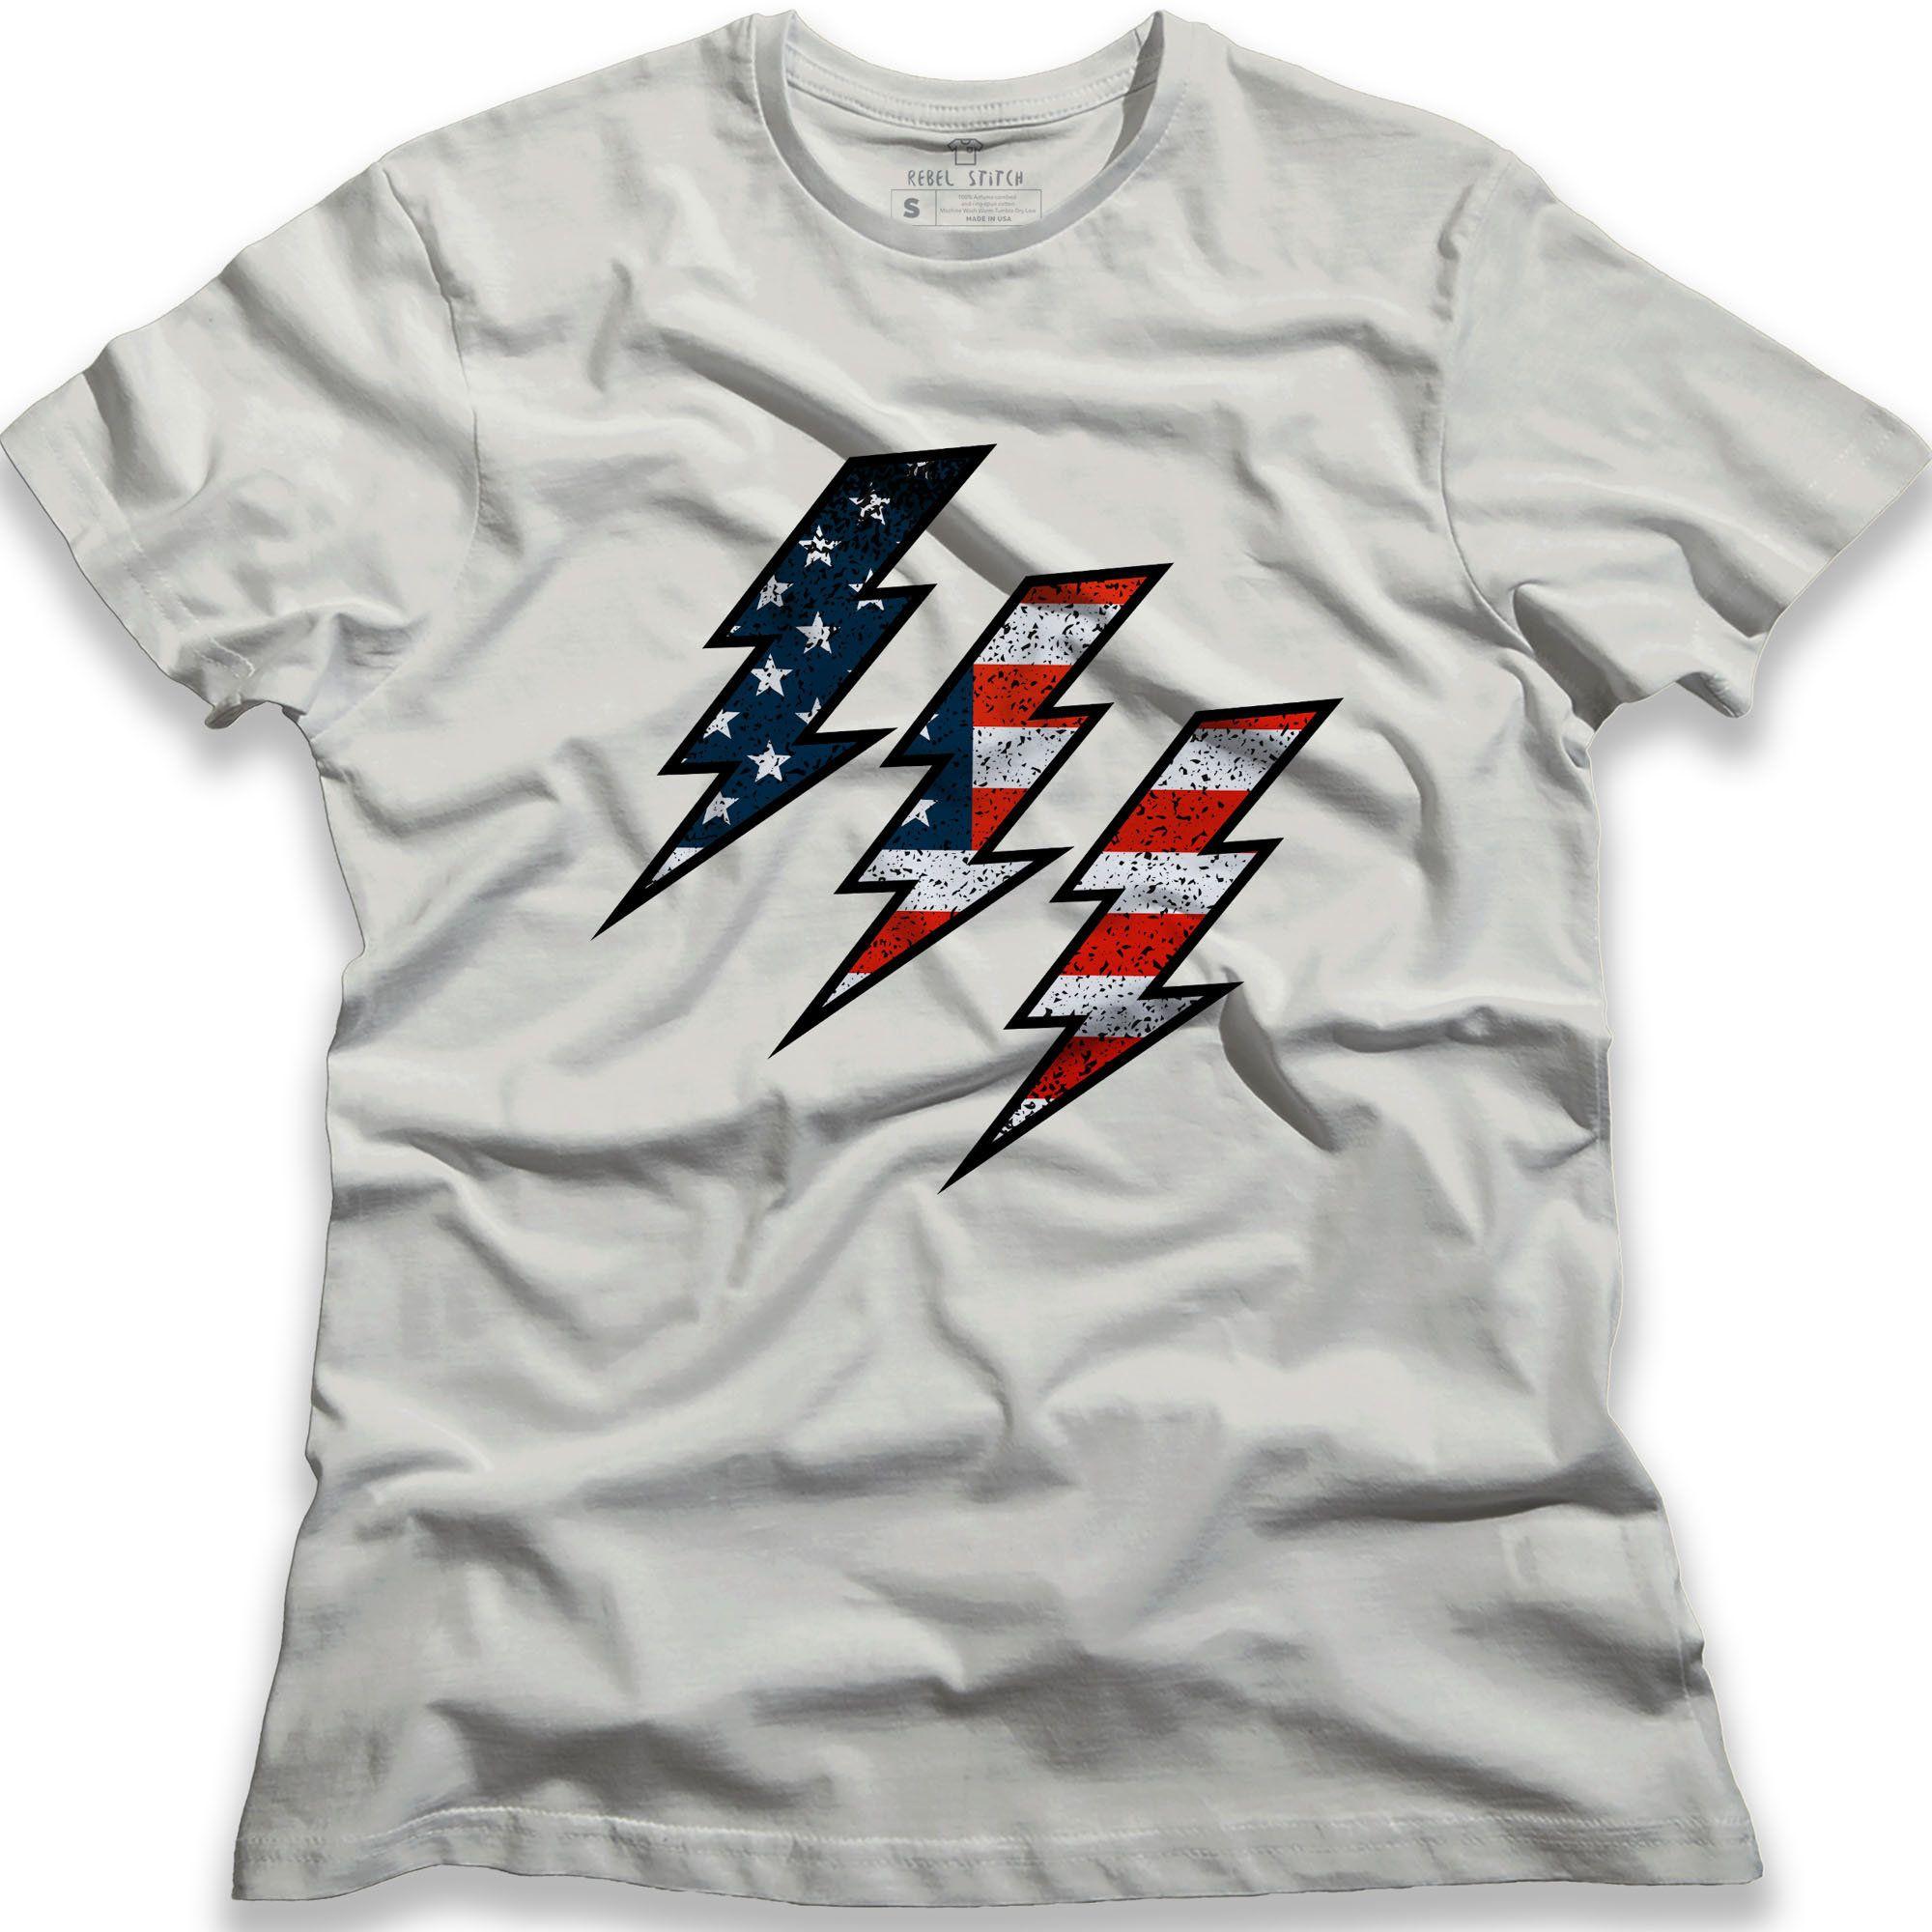 Flag Bolt T Shirt American Flag Tees Usa Pride Usa Flag Graphic Apparel Graphic Tees Women T Shirts In 2020 American Flag Tee Flag Tee Graphic Apparel